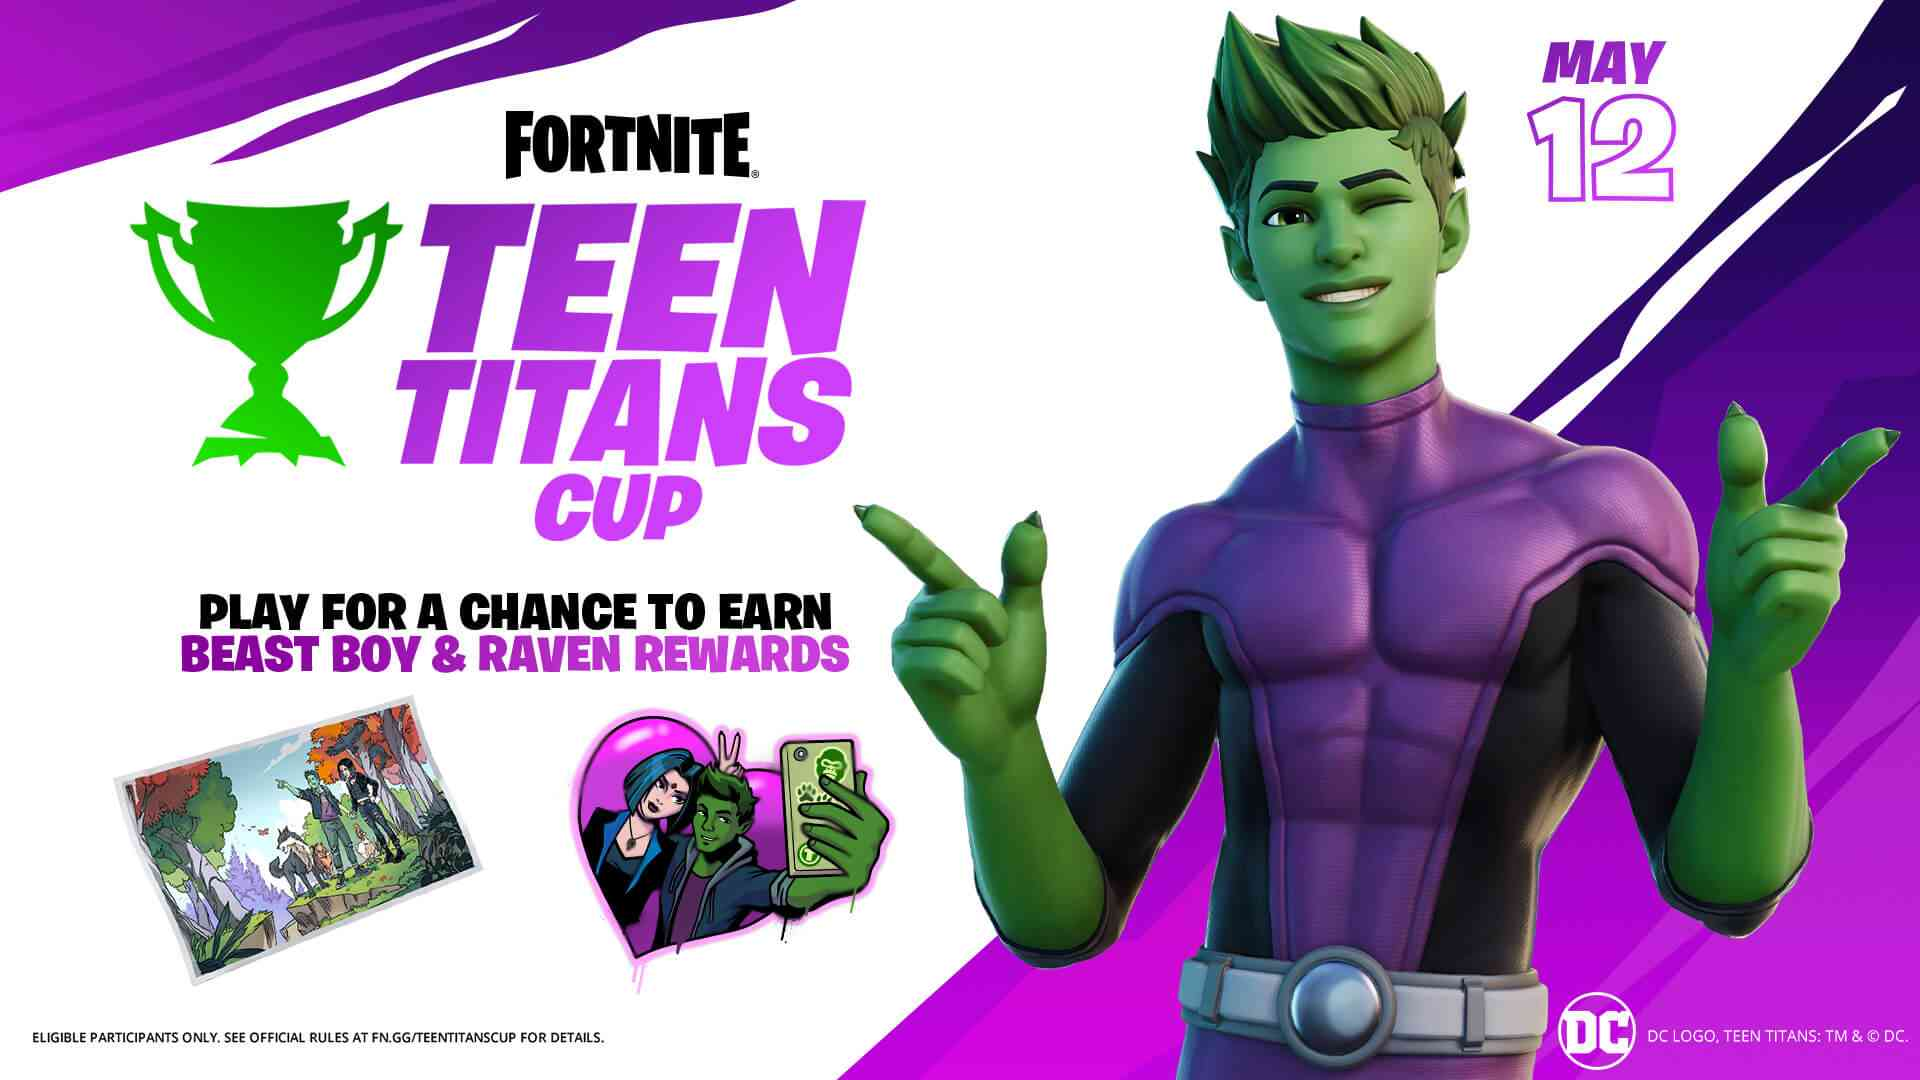 Fortnite Teen Titans Cup Details